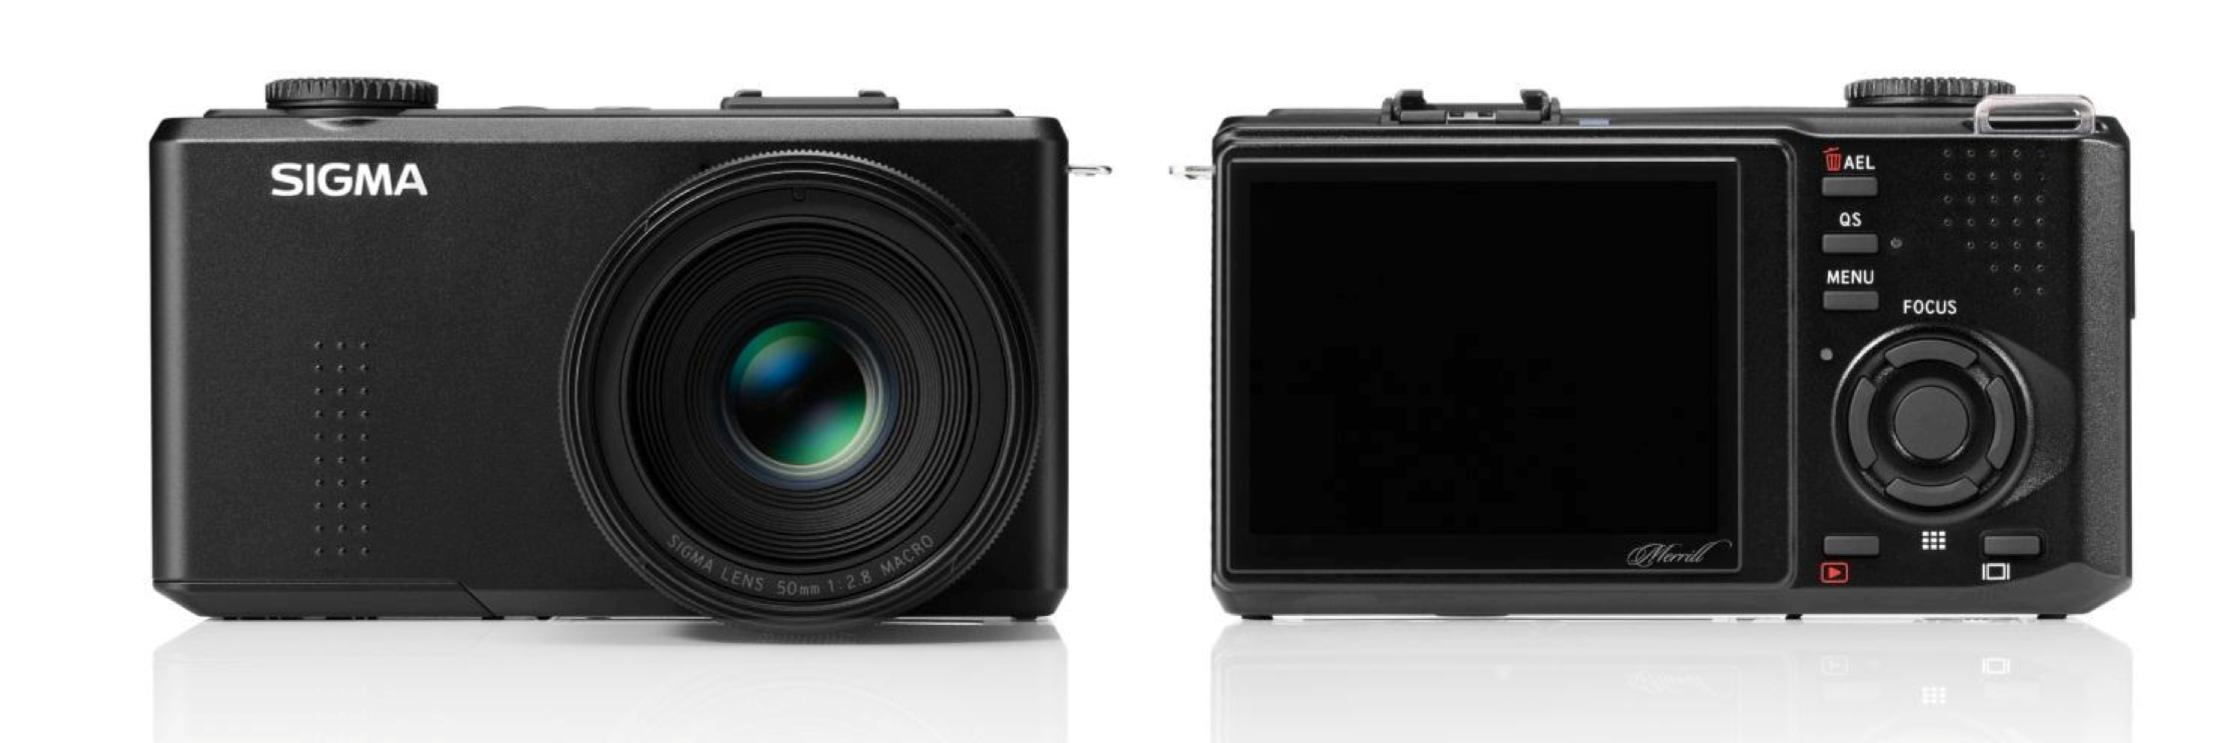 Sigma ruller ut nytt kamera